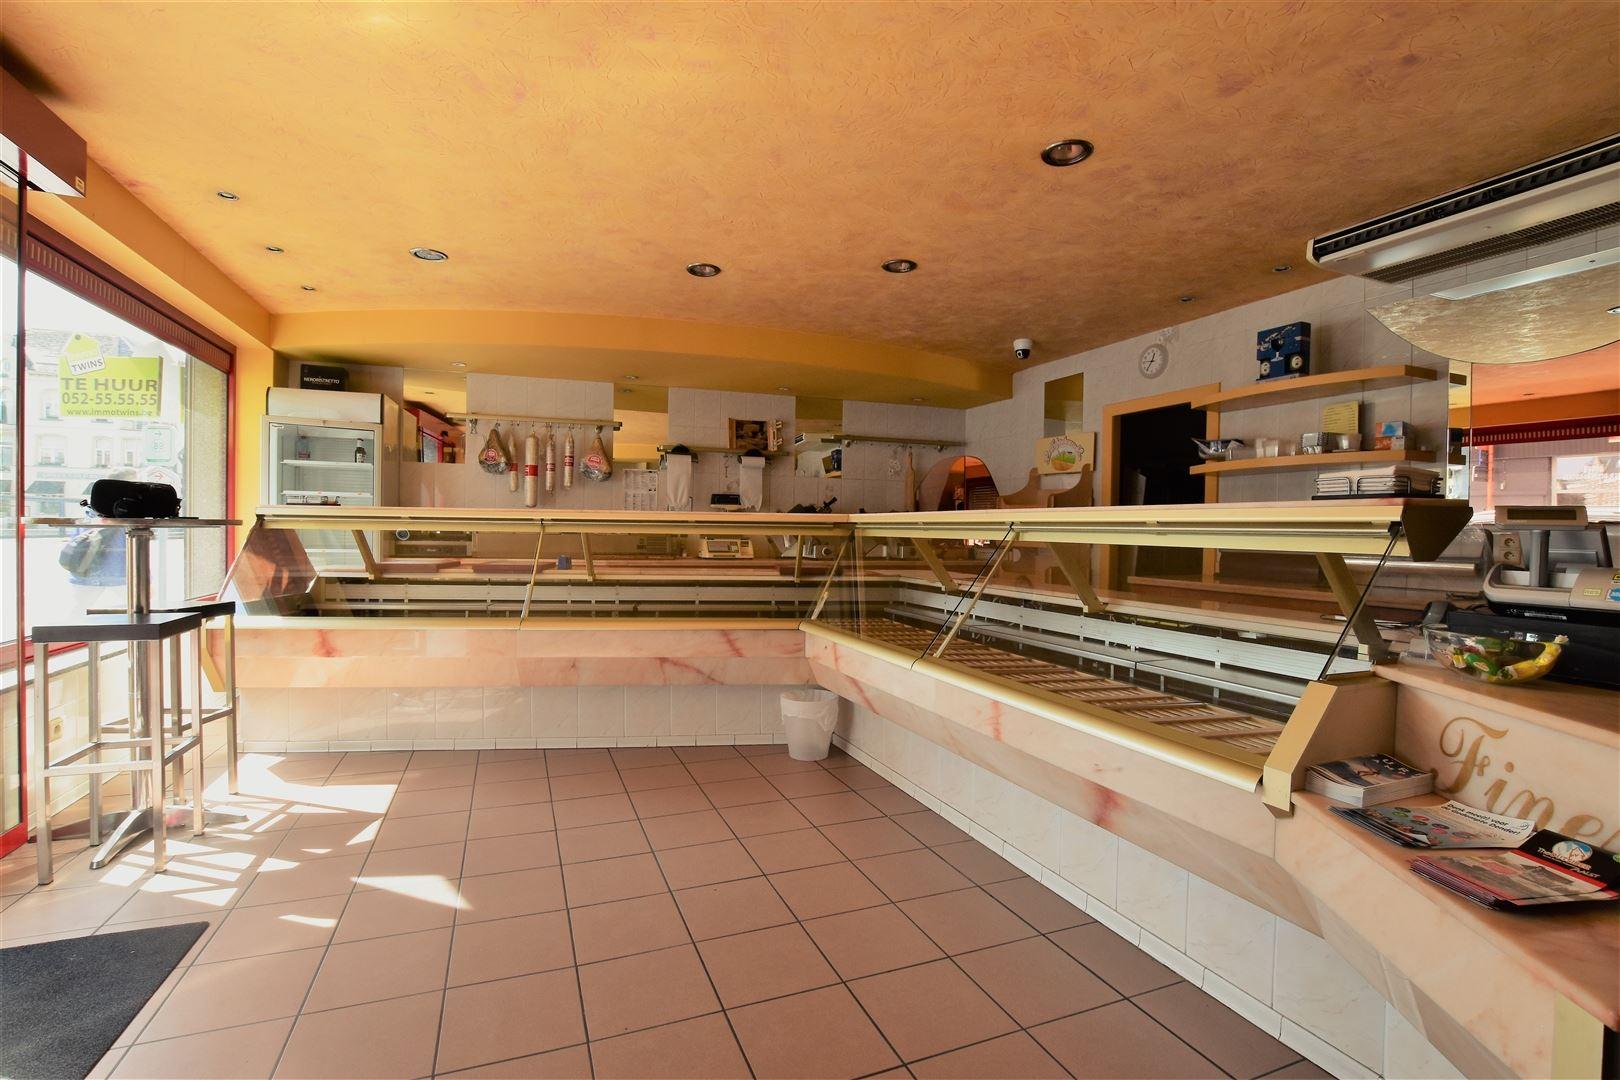 Foto 3 : Handelspand te 9200 Dendermonde (België) - Prijs € 1.250